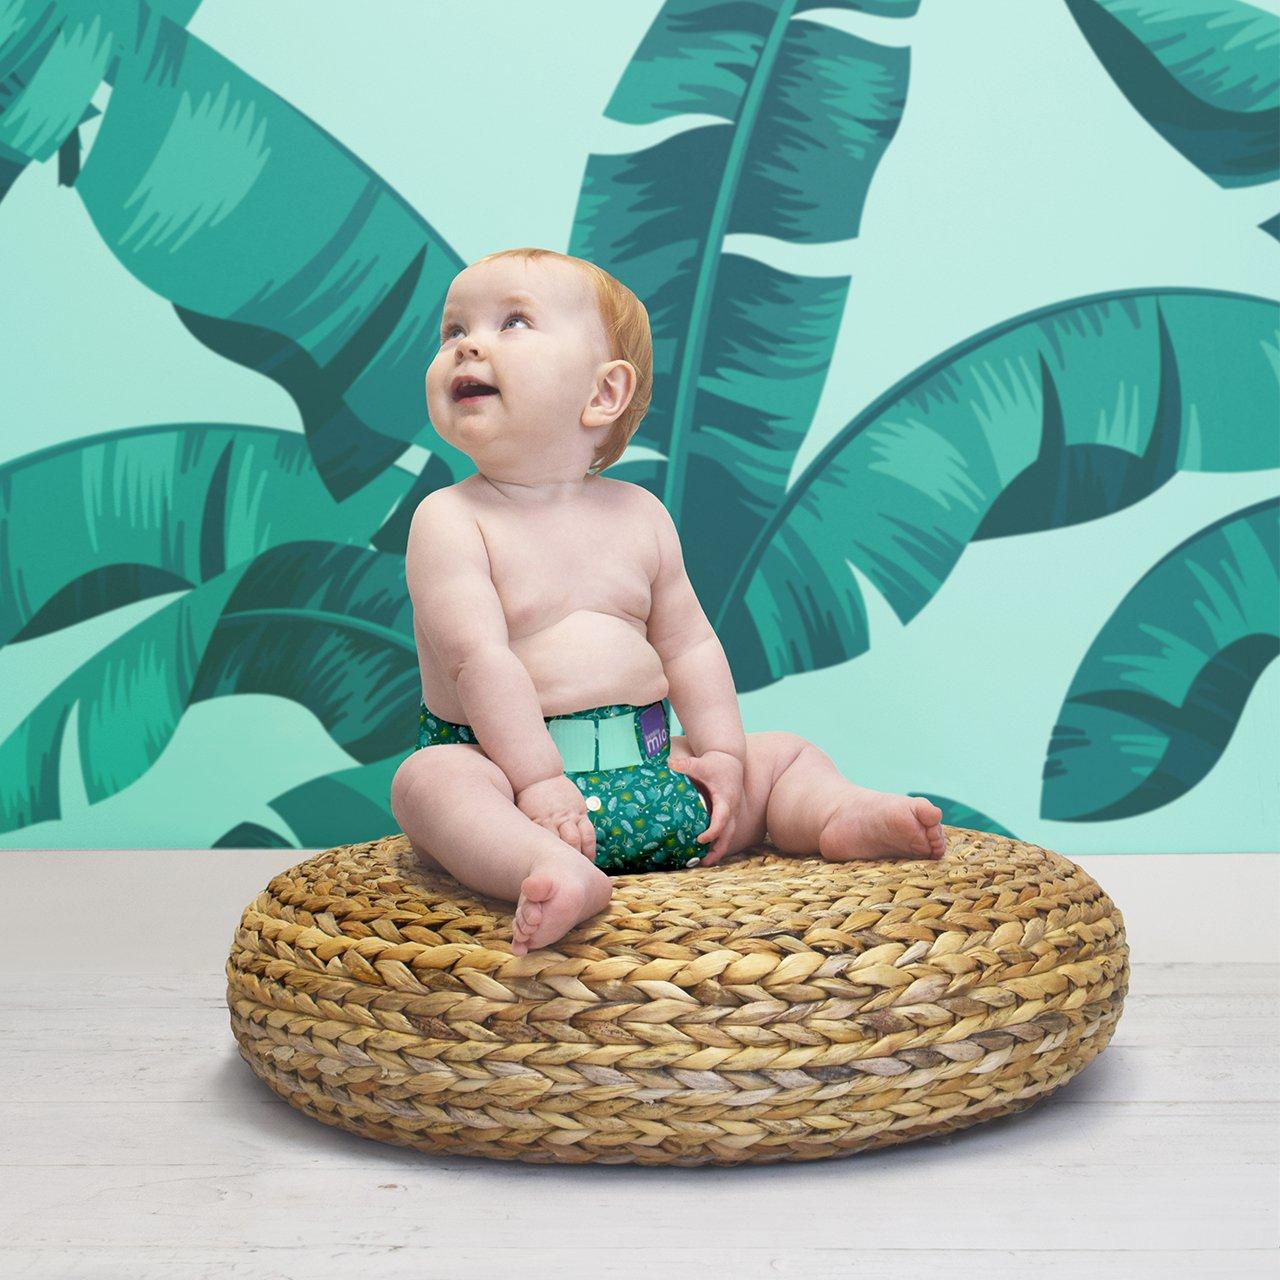 Bambino Mio Miosolo Cloth Diaper Set, Rainforest by Bambino Mio (Image #2)